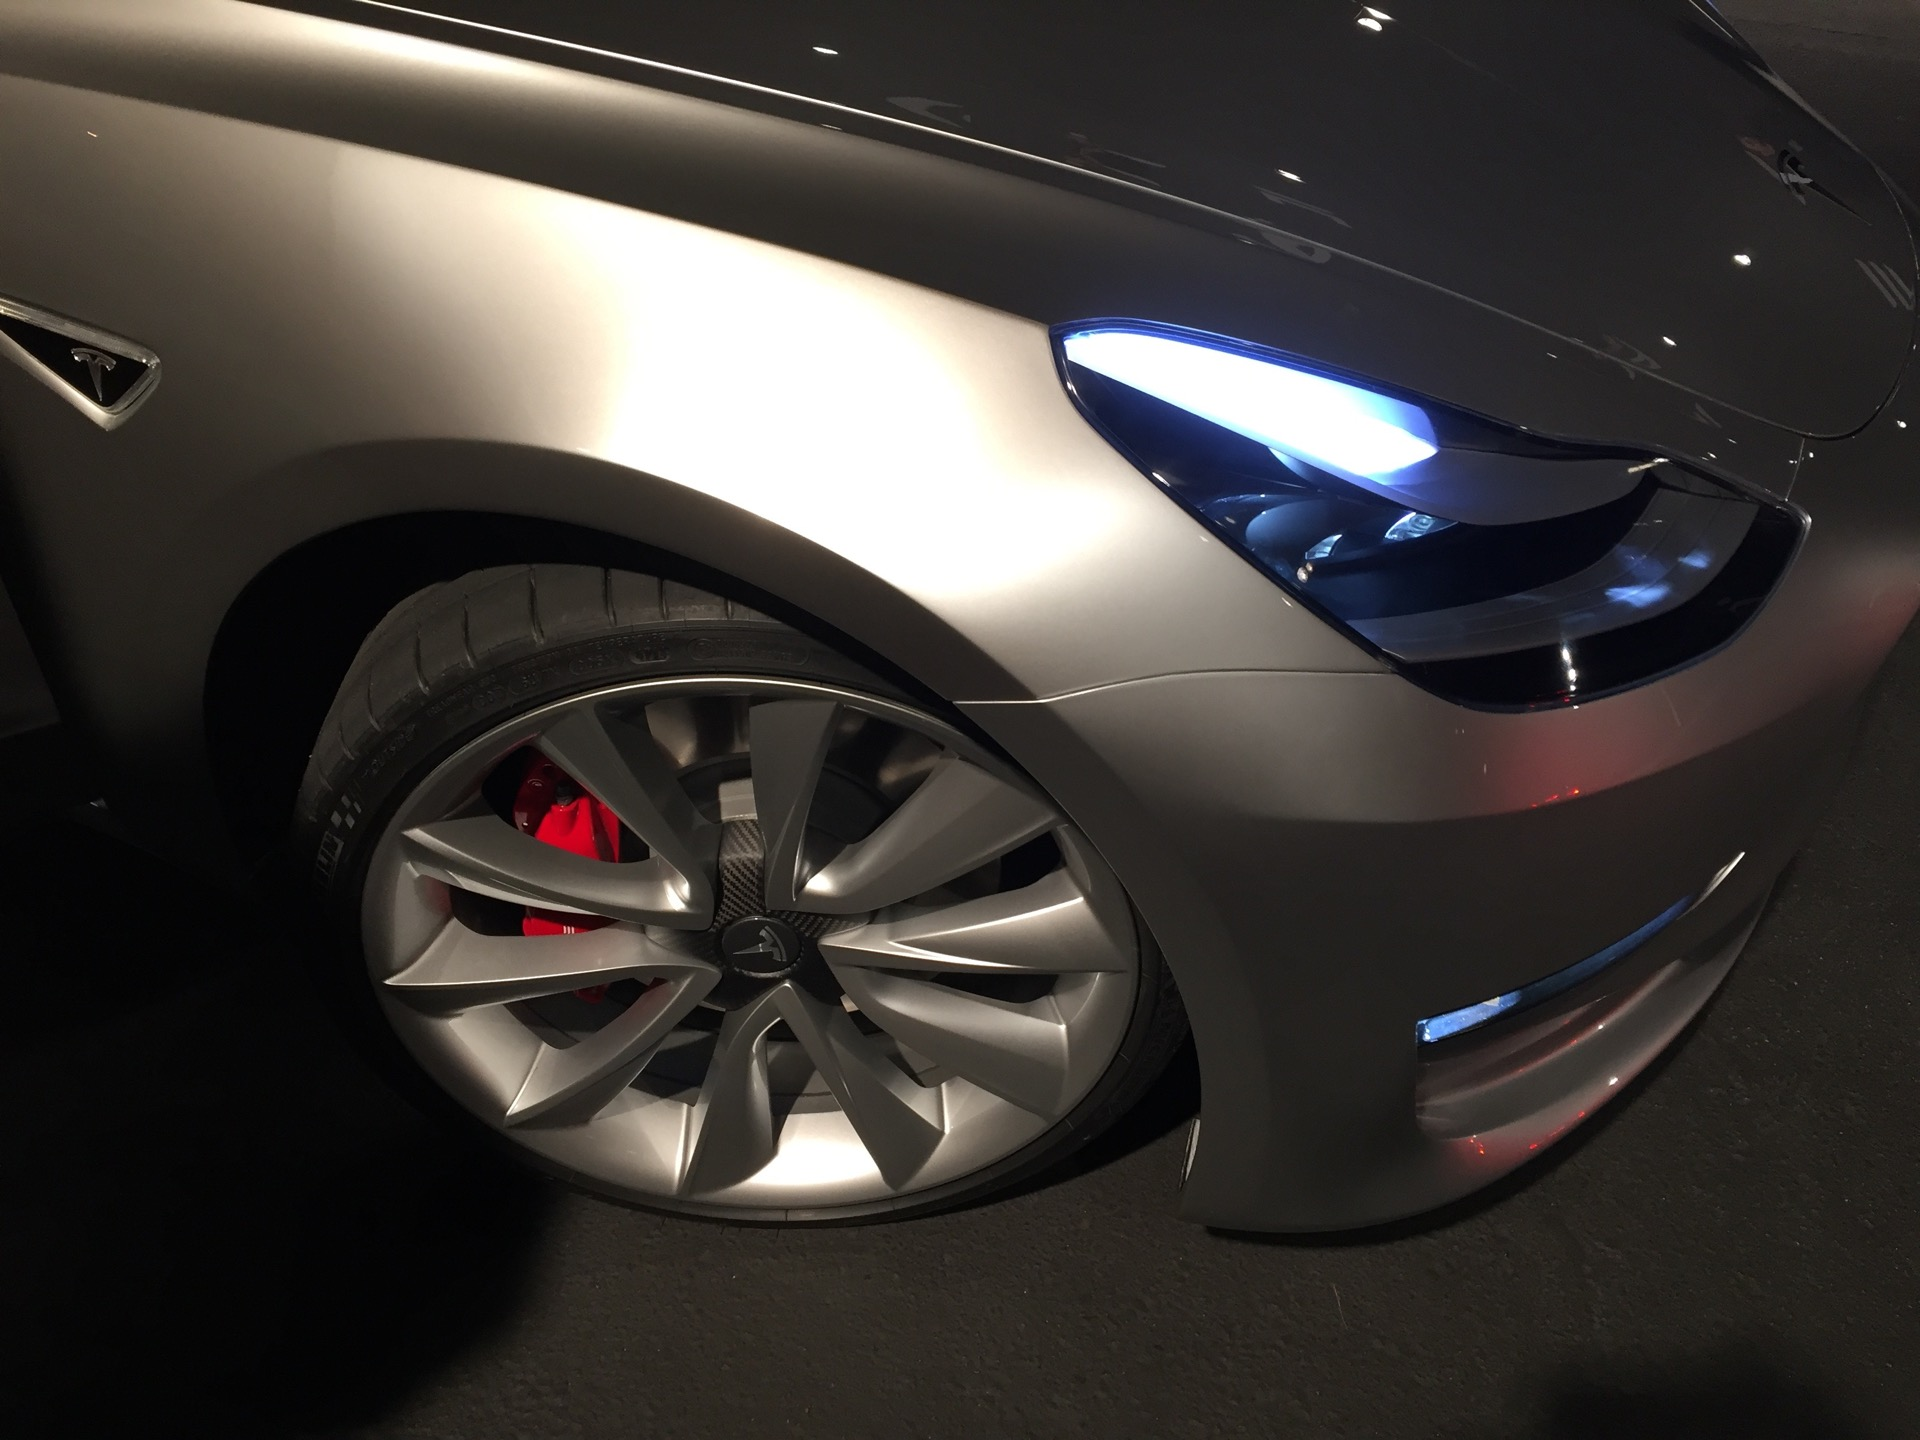 Design of tesla car - Design Of Tesla Car 77